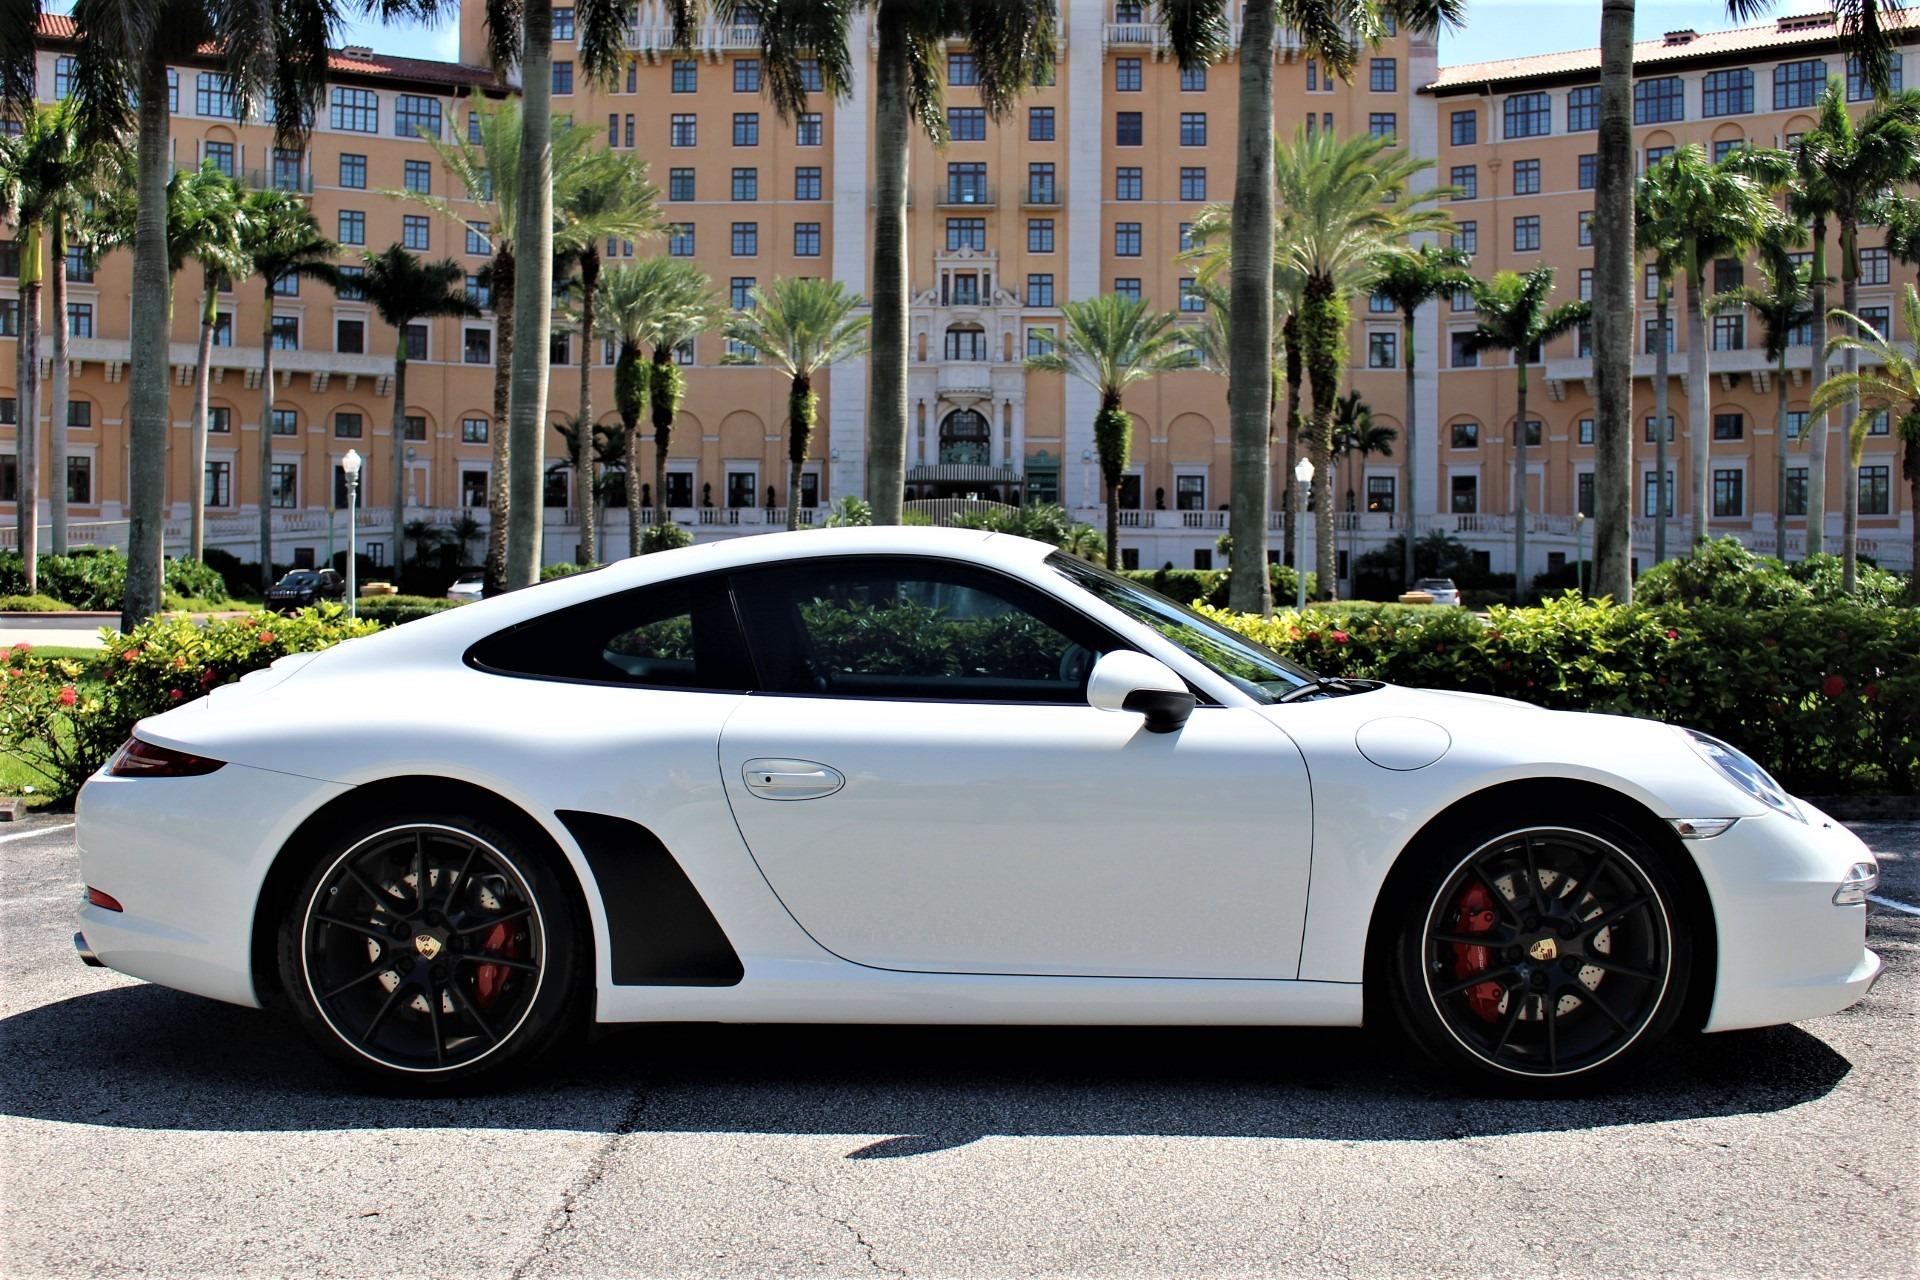 Used 2013 Porsche 911 Carrera S for sale $67,850 at The Gables Sports Cars in Miami FL 33146 1